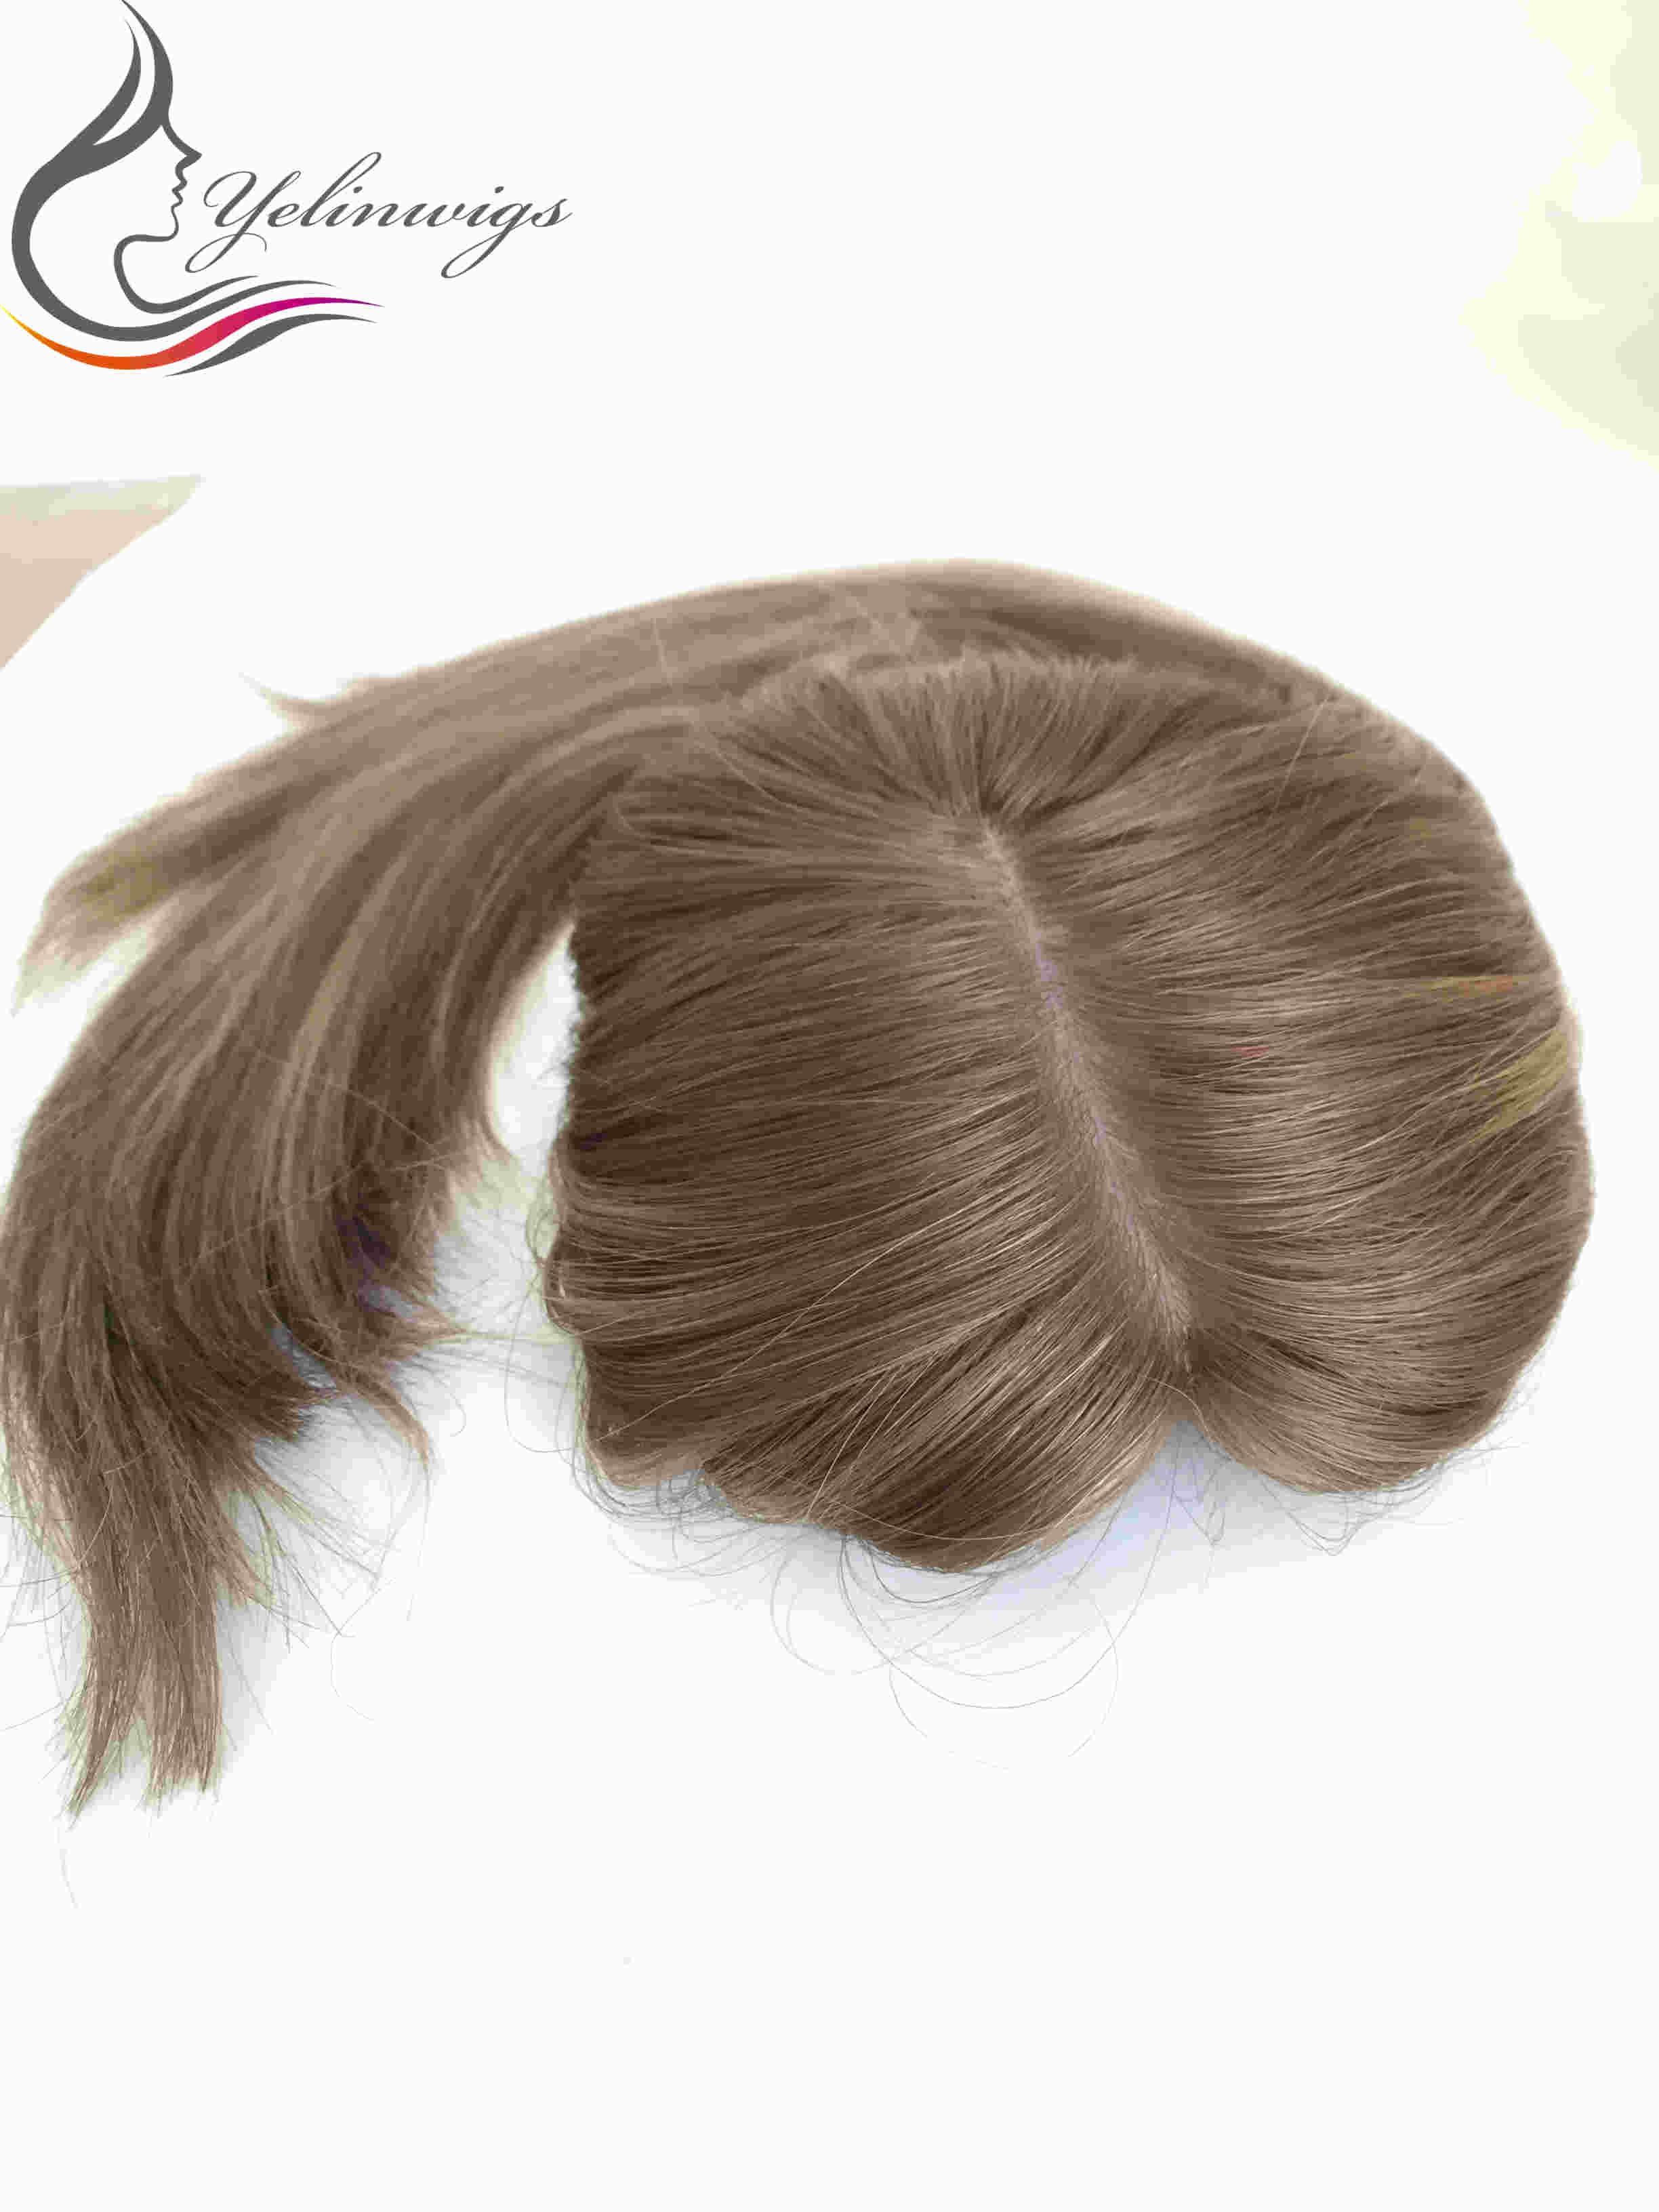 Yelin Wigs Blonde Color Jewish Topper Hair Pieces High Quality European Hair Kippah Fall Kosher Hair Pieces